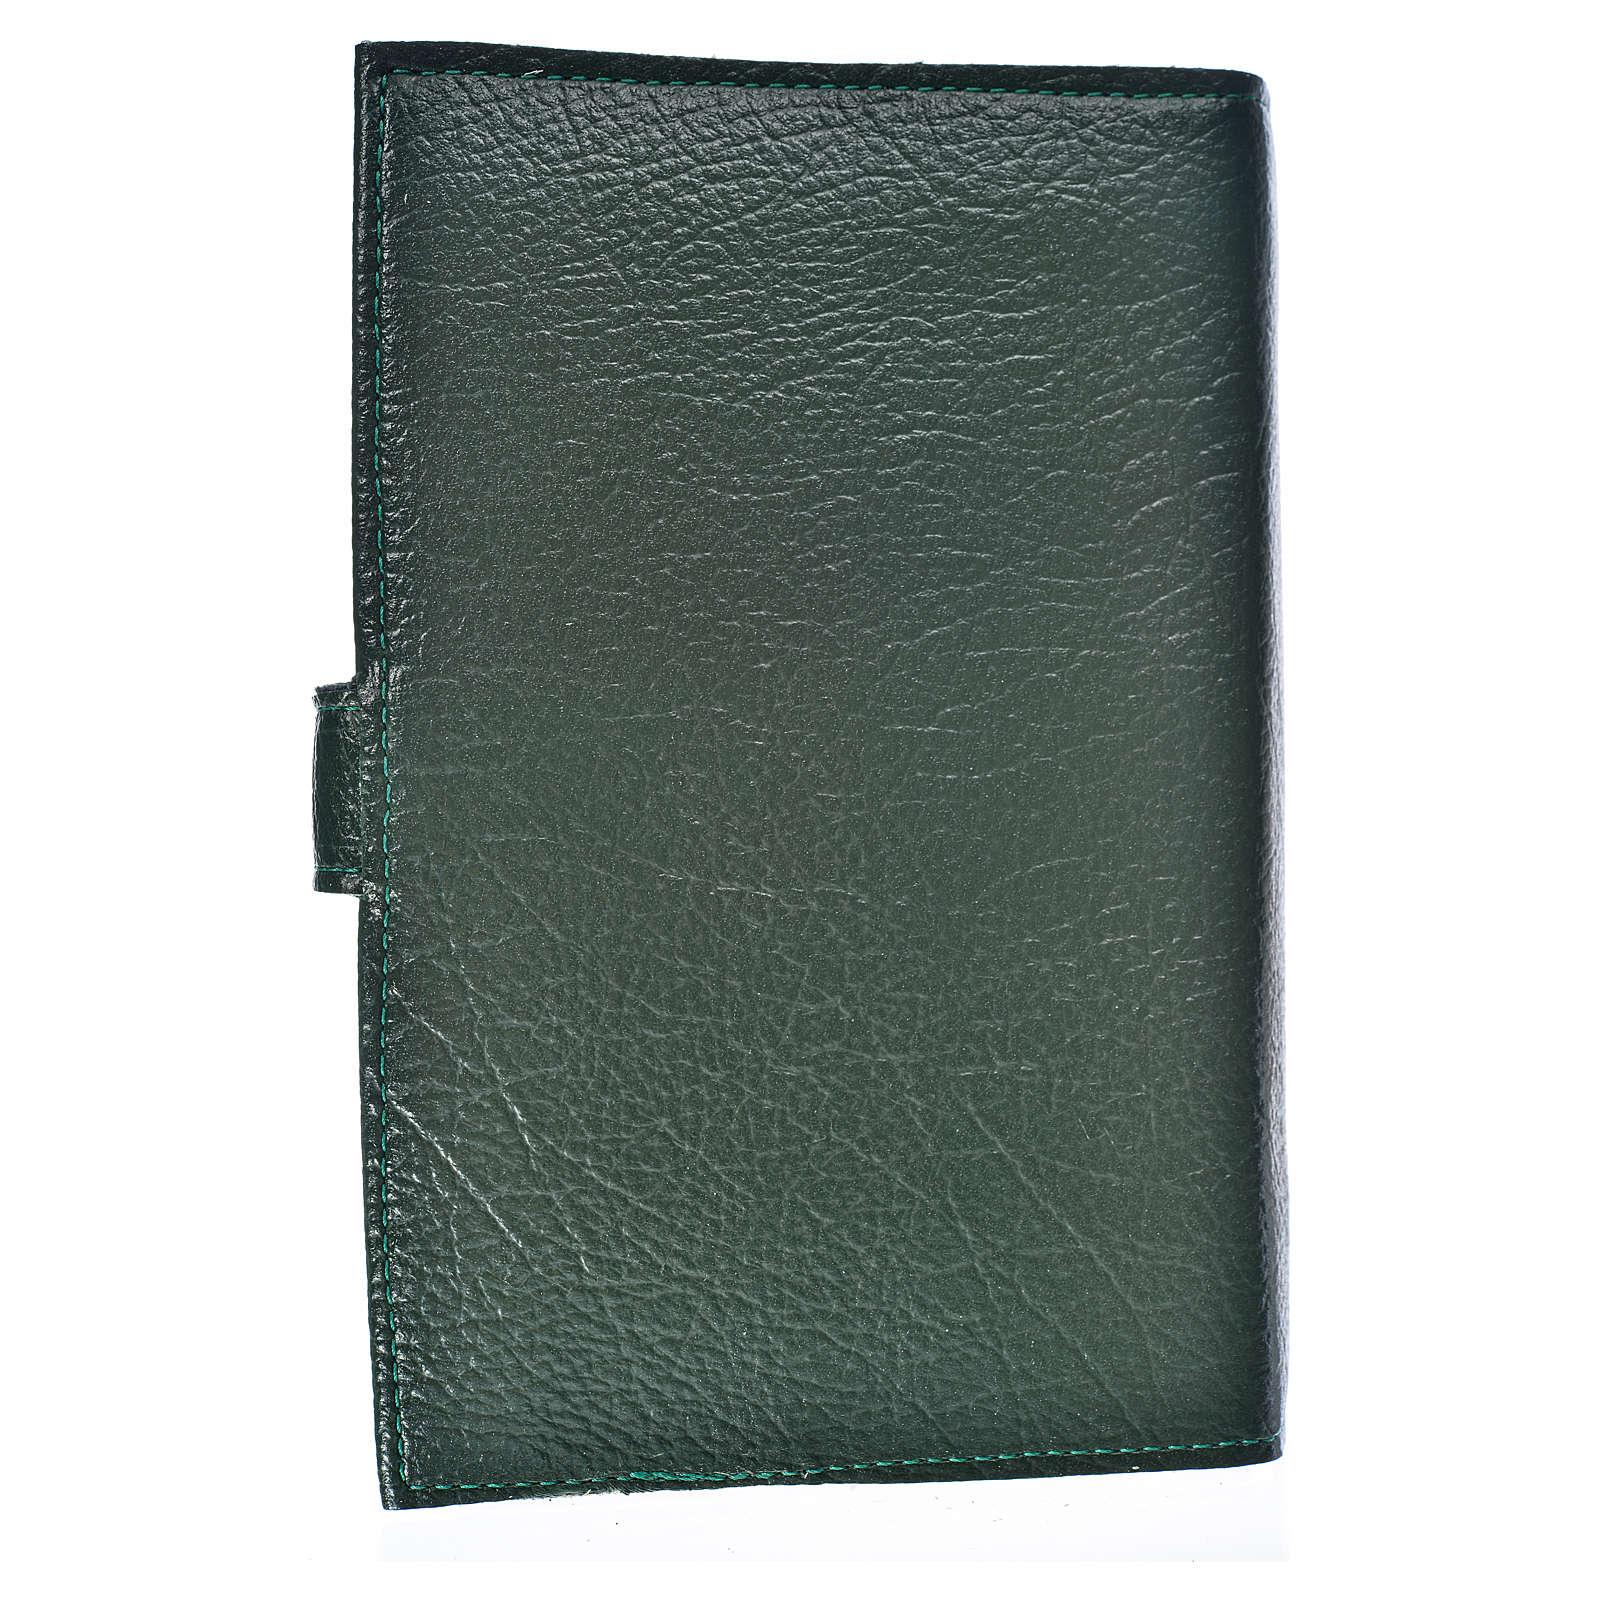 Funda Biblia Jerusalén Nueva Ed. S. Familia s. cuero verde 4